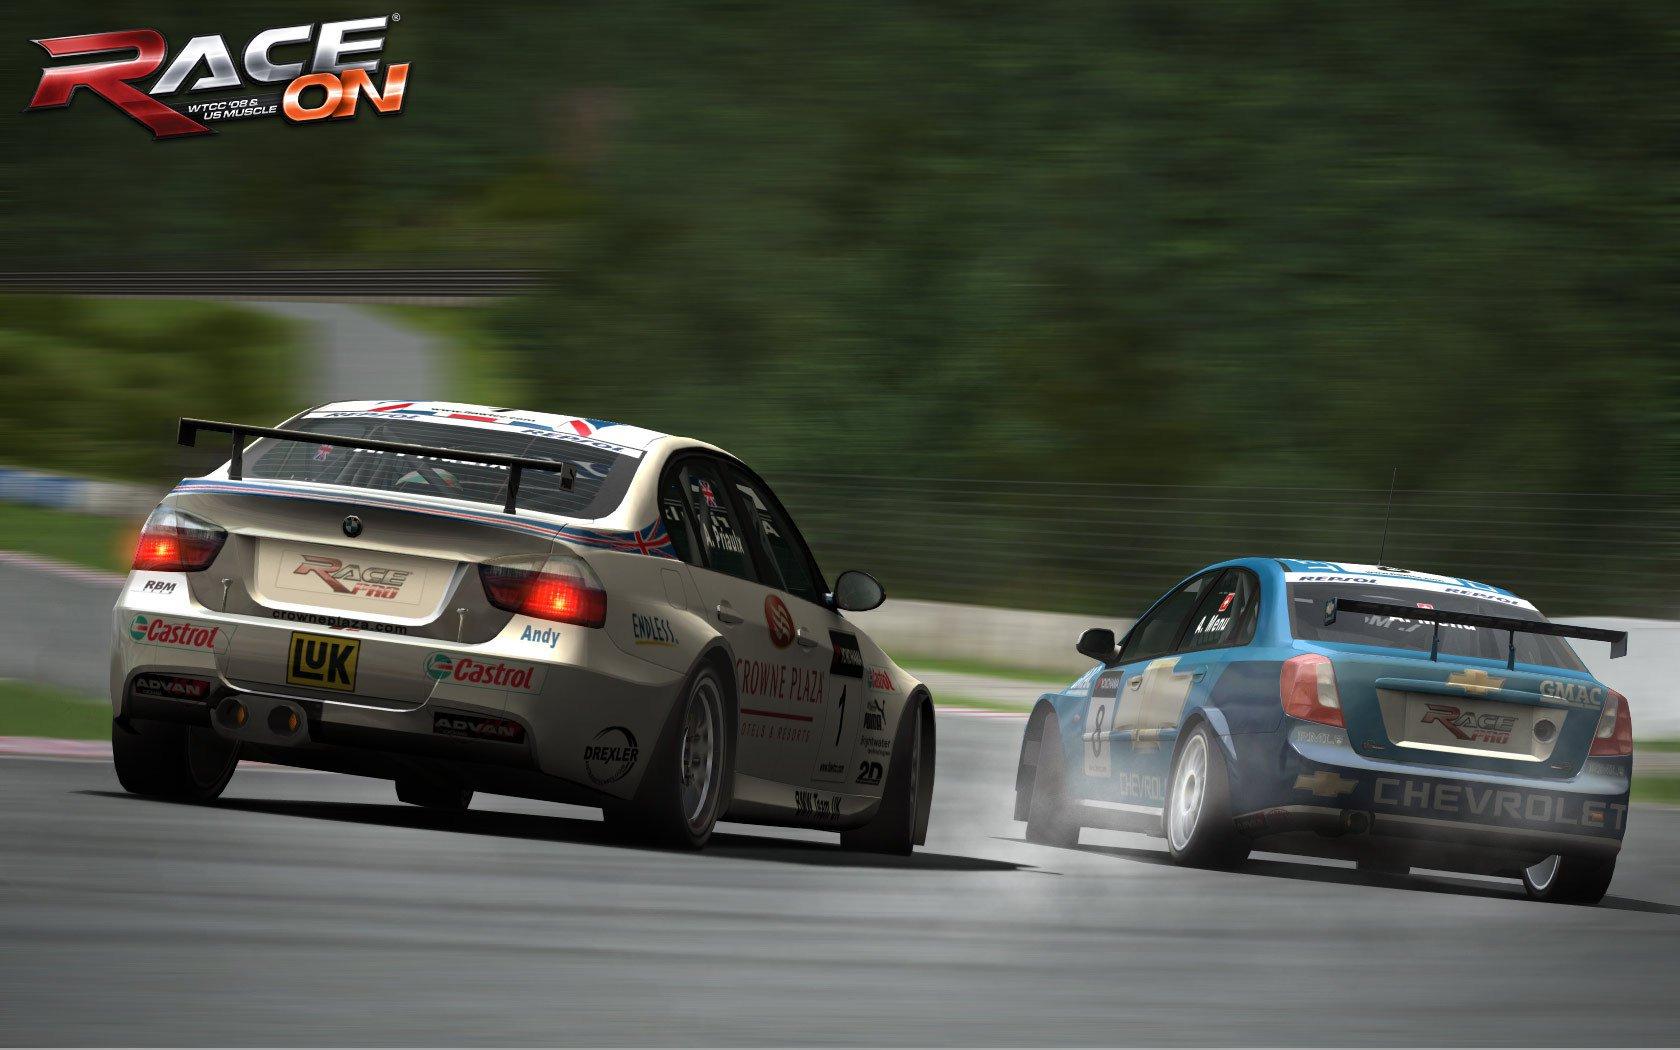 RACE On 23